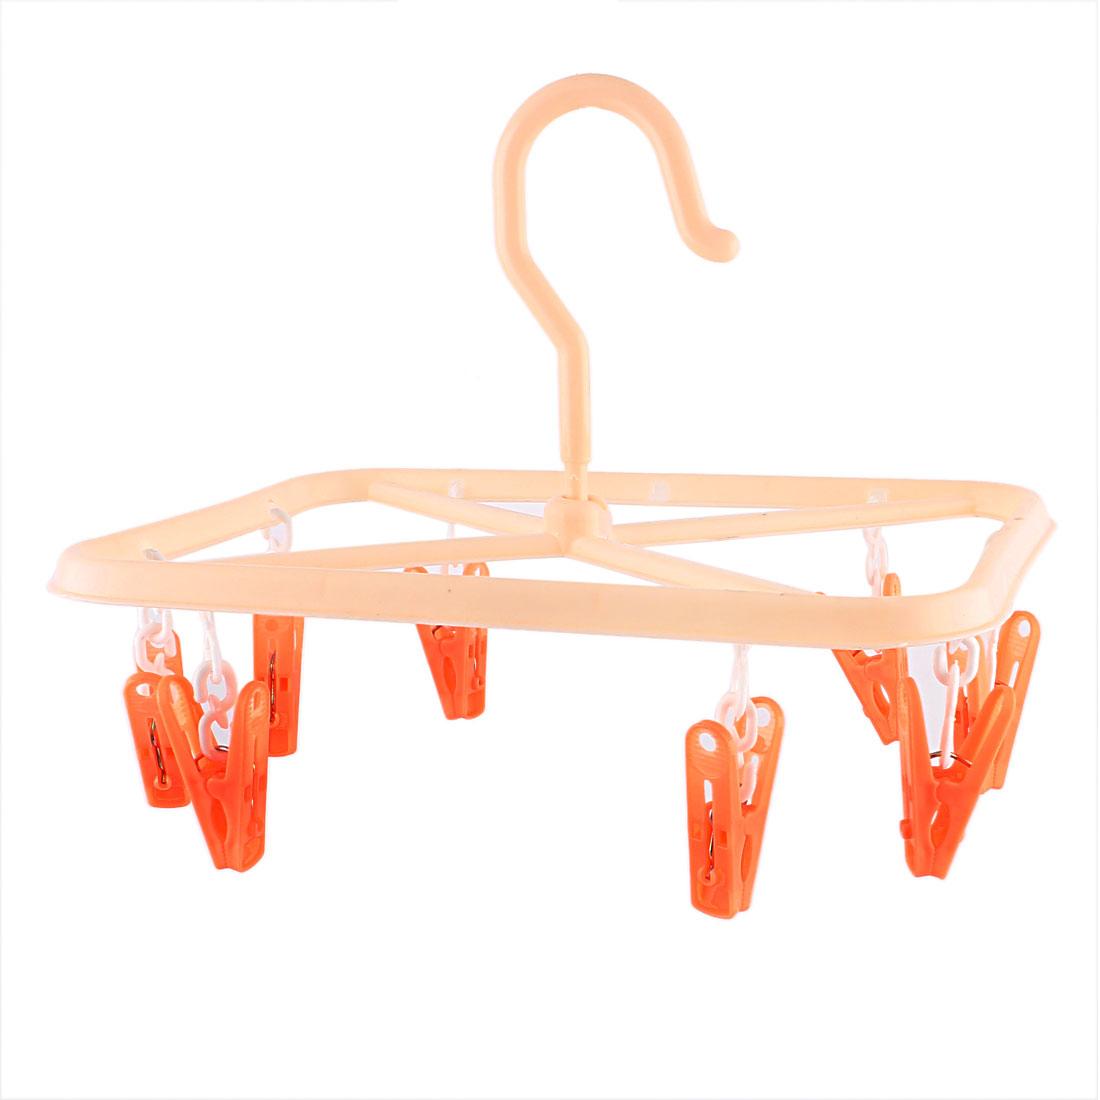 Unique Bargains Plastic Rectangle Frame 8 Pegs Clothes Socks Dryer Rack Clips Hanger Orange